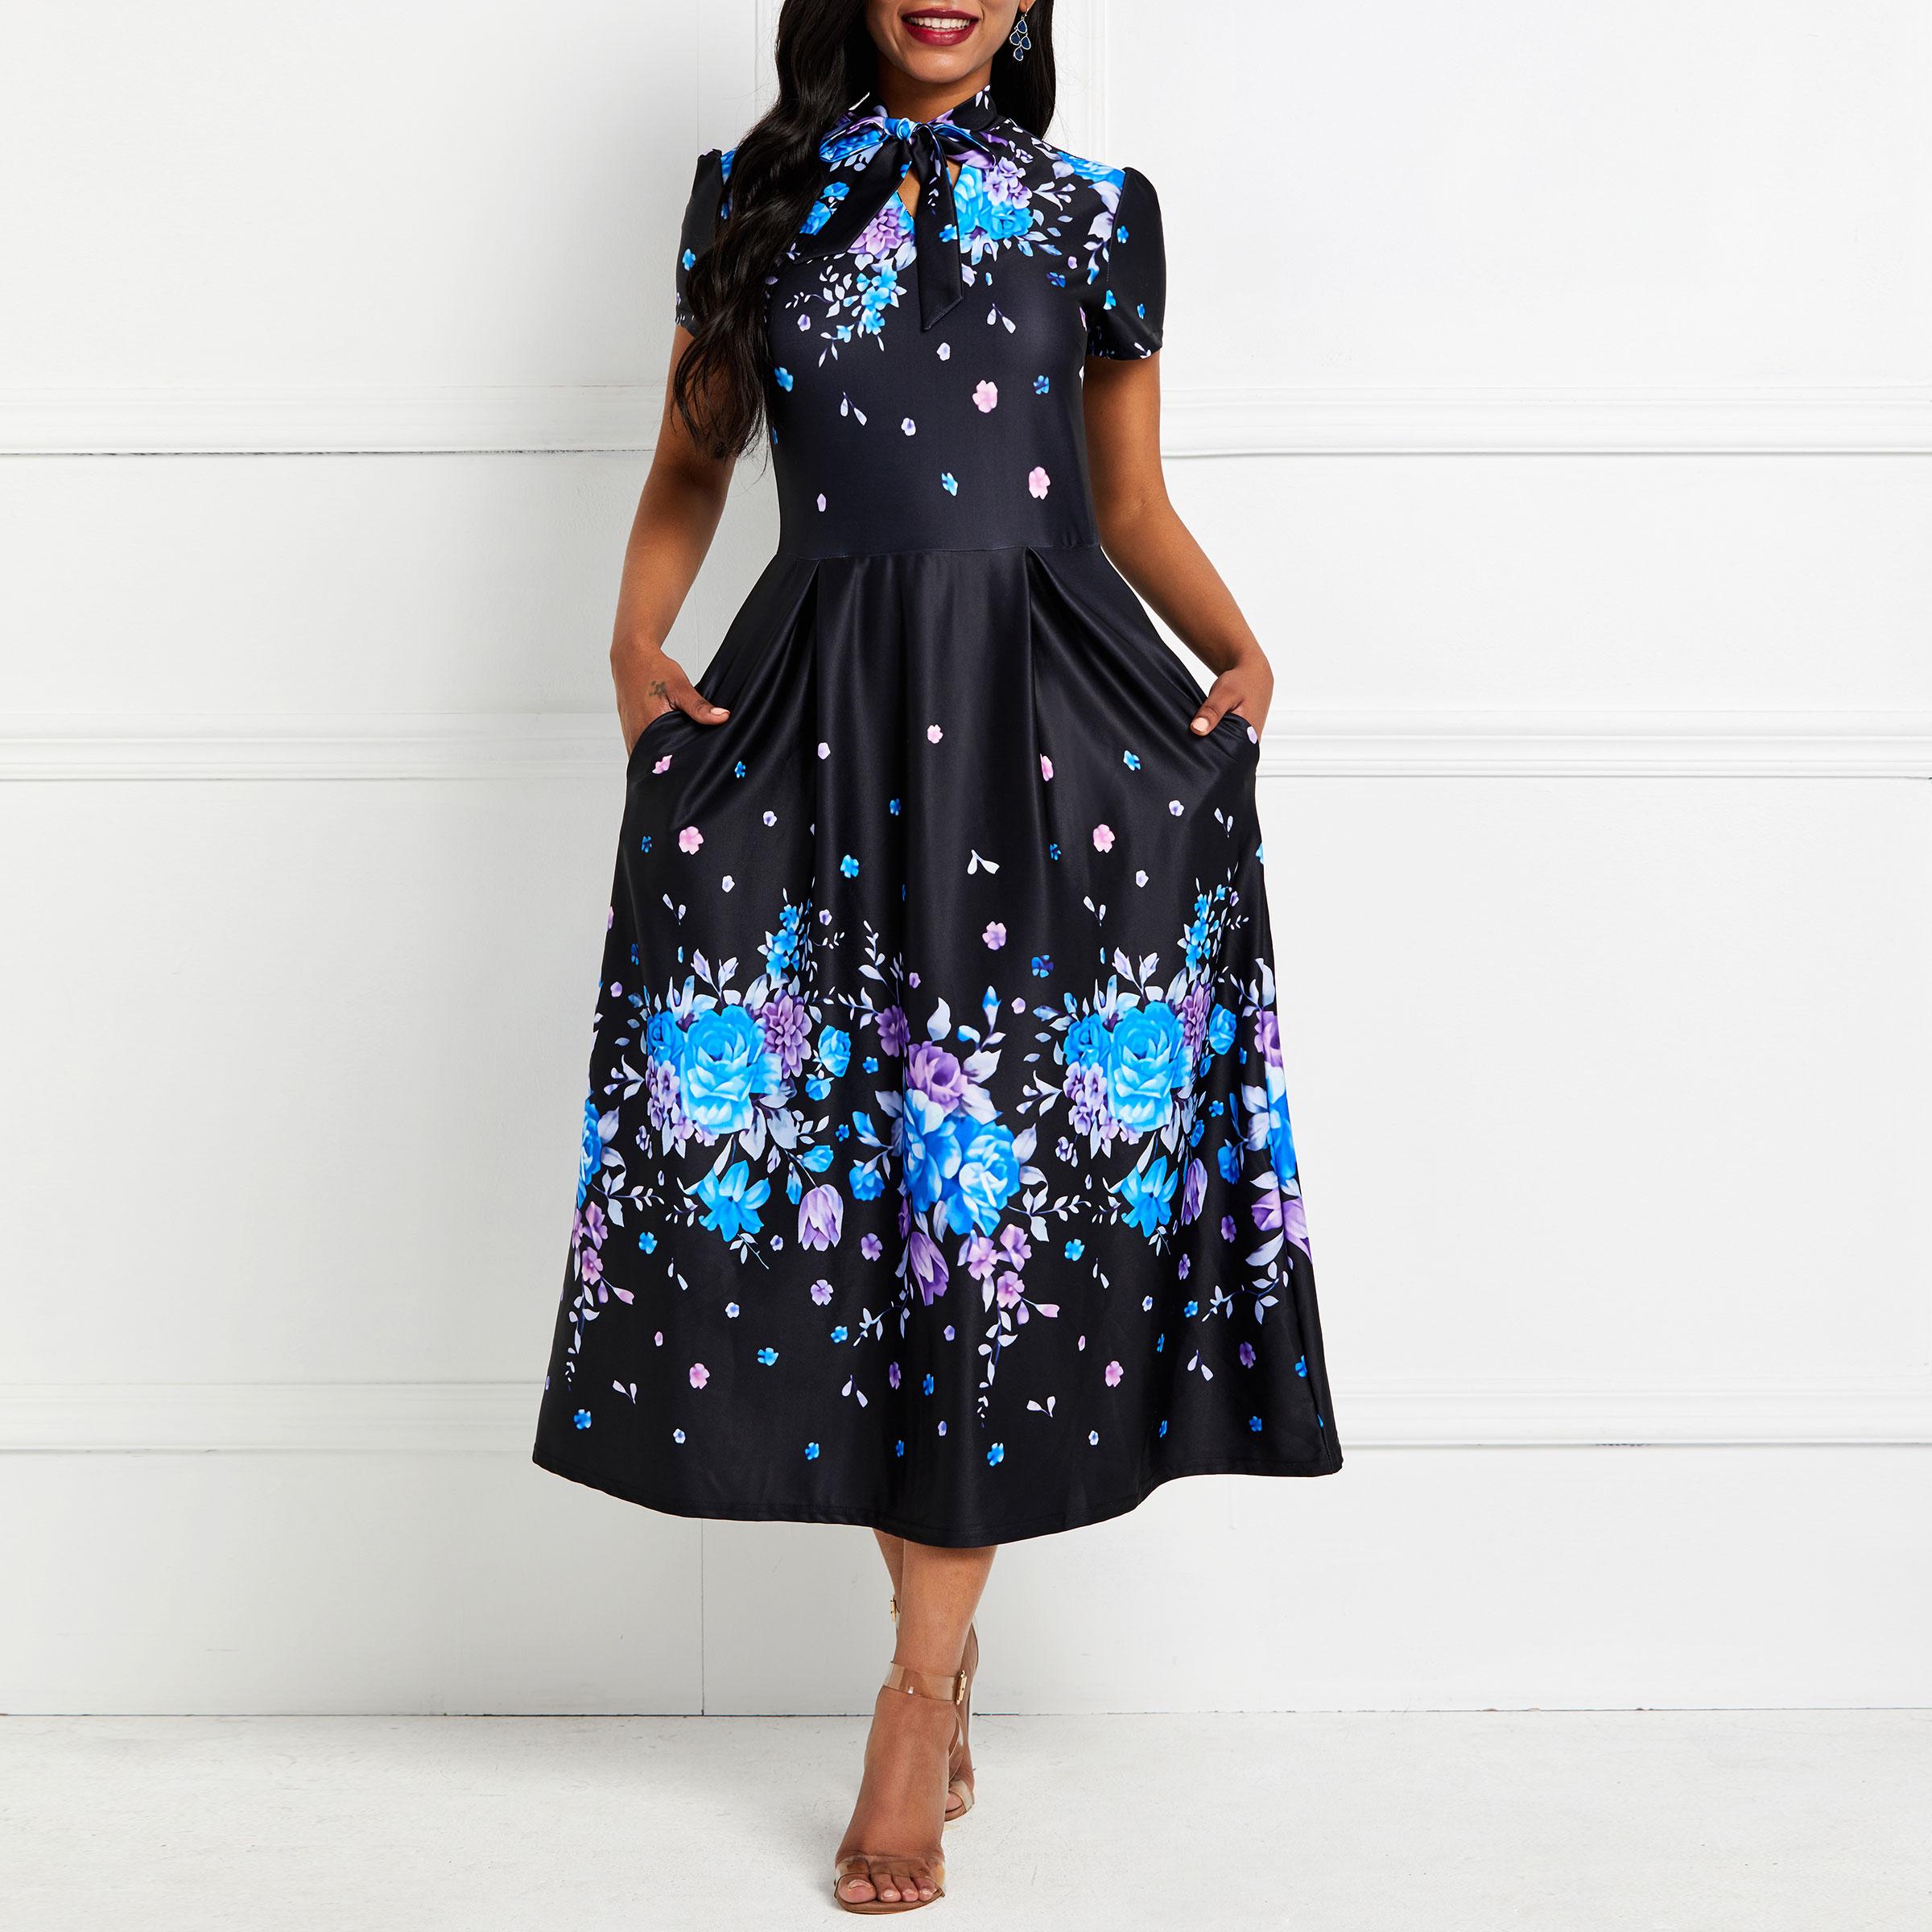 Summer Dresses Elegant Floral Print Fashion Women Blue Holiday Casual Street Ladies Slim Sweet A Line Robe Vintage Midi Dress